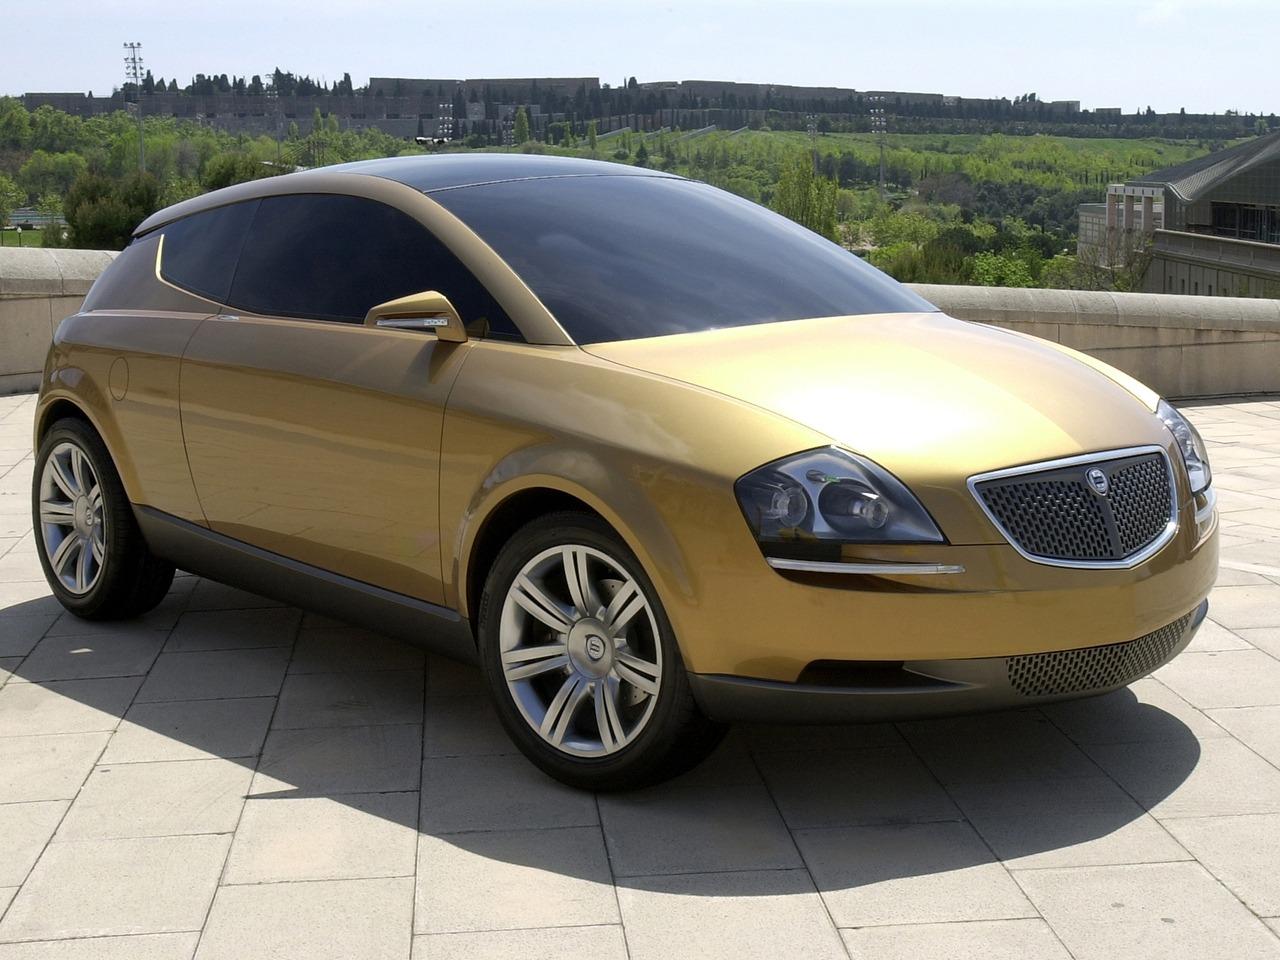 http://oldconceptcars.com/wp-content/uploads/lancia_granturismo_stilnovo_concept_13.jpg